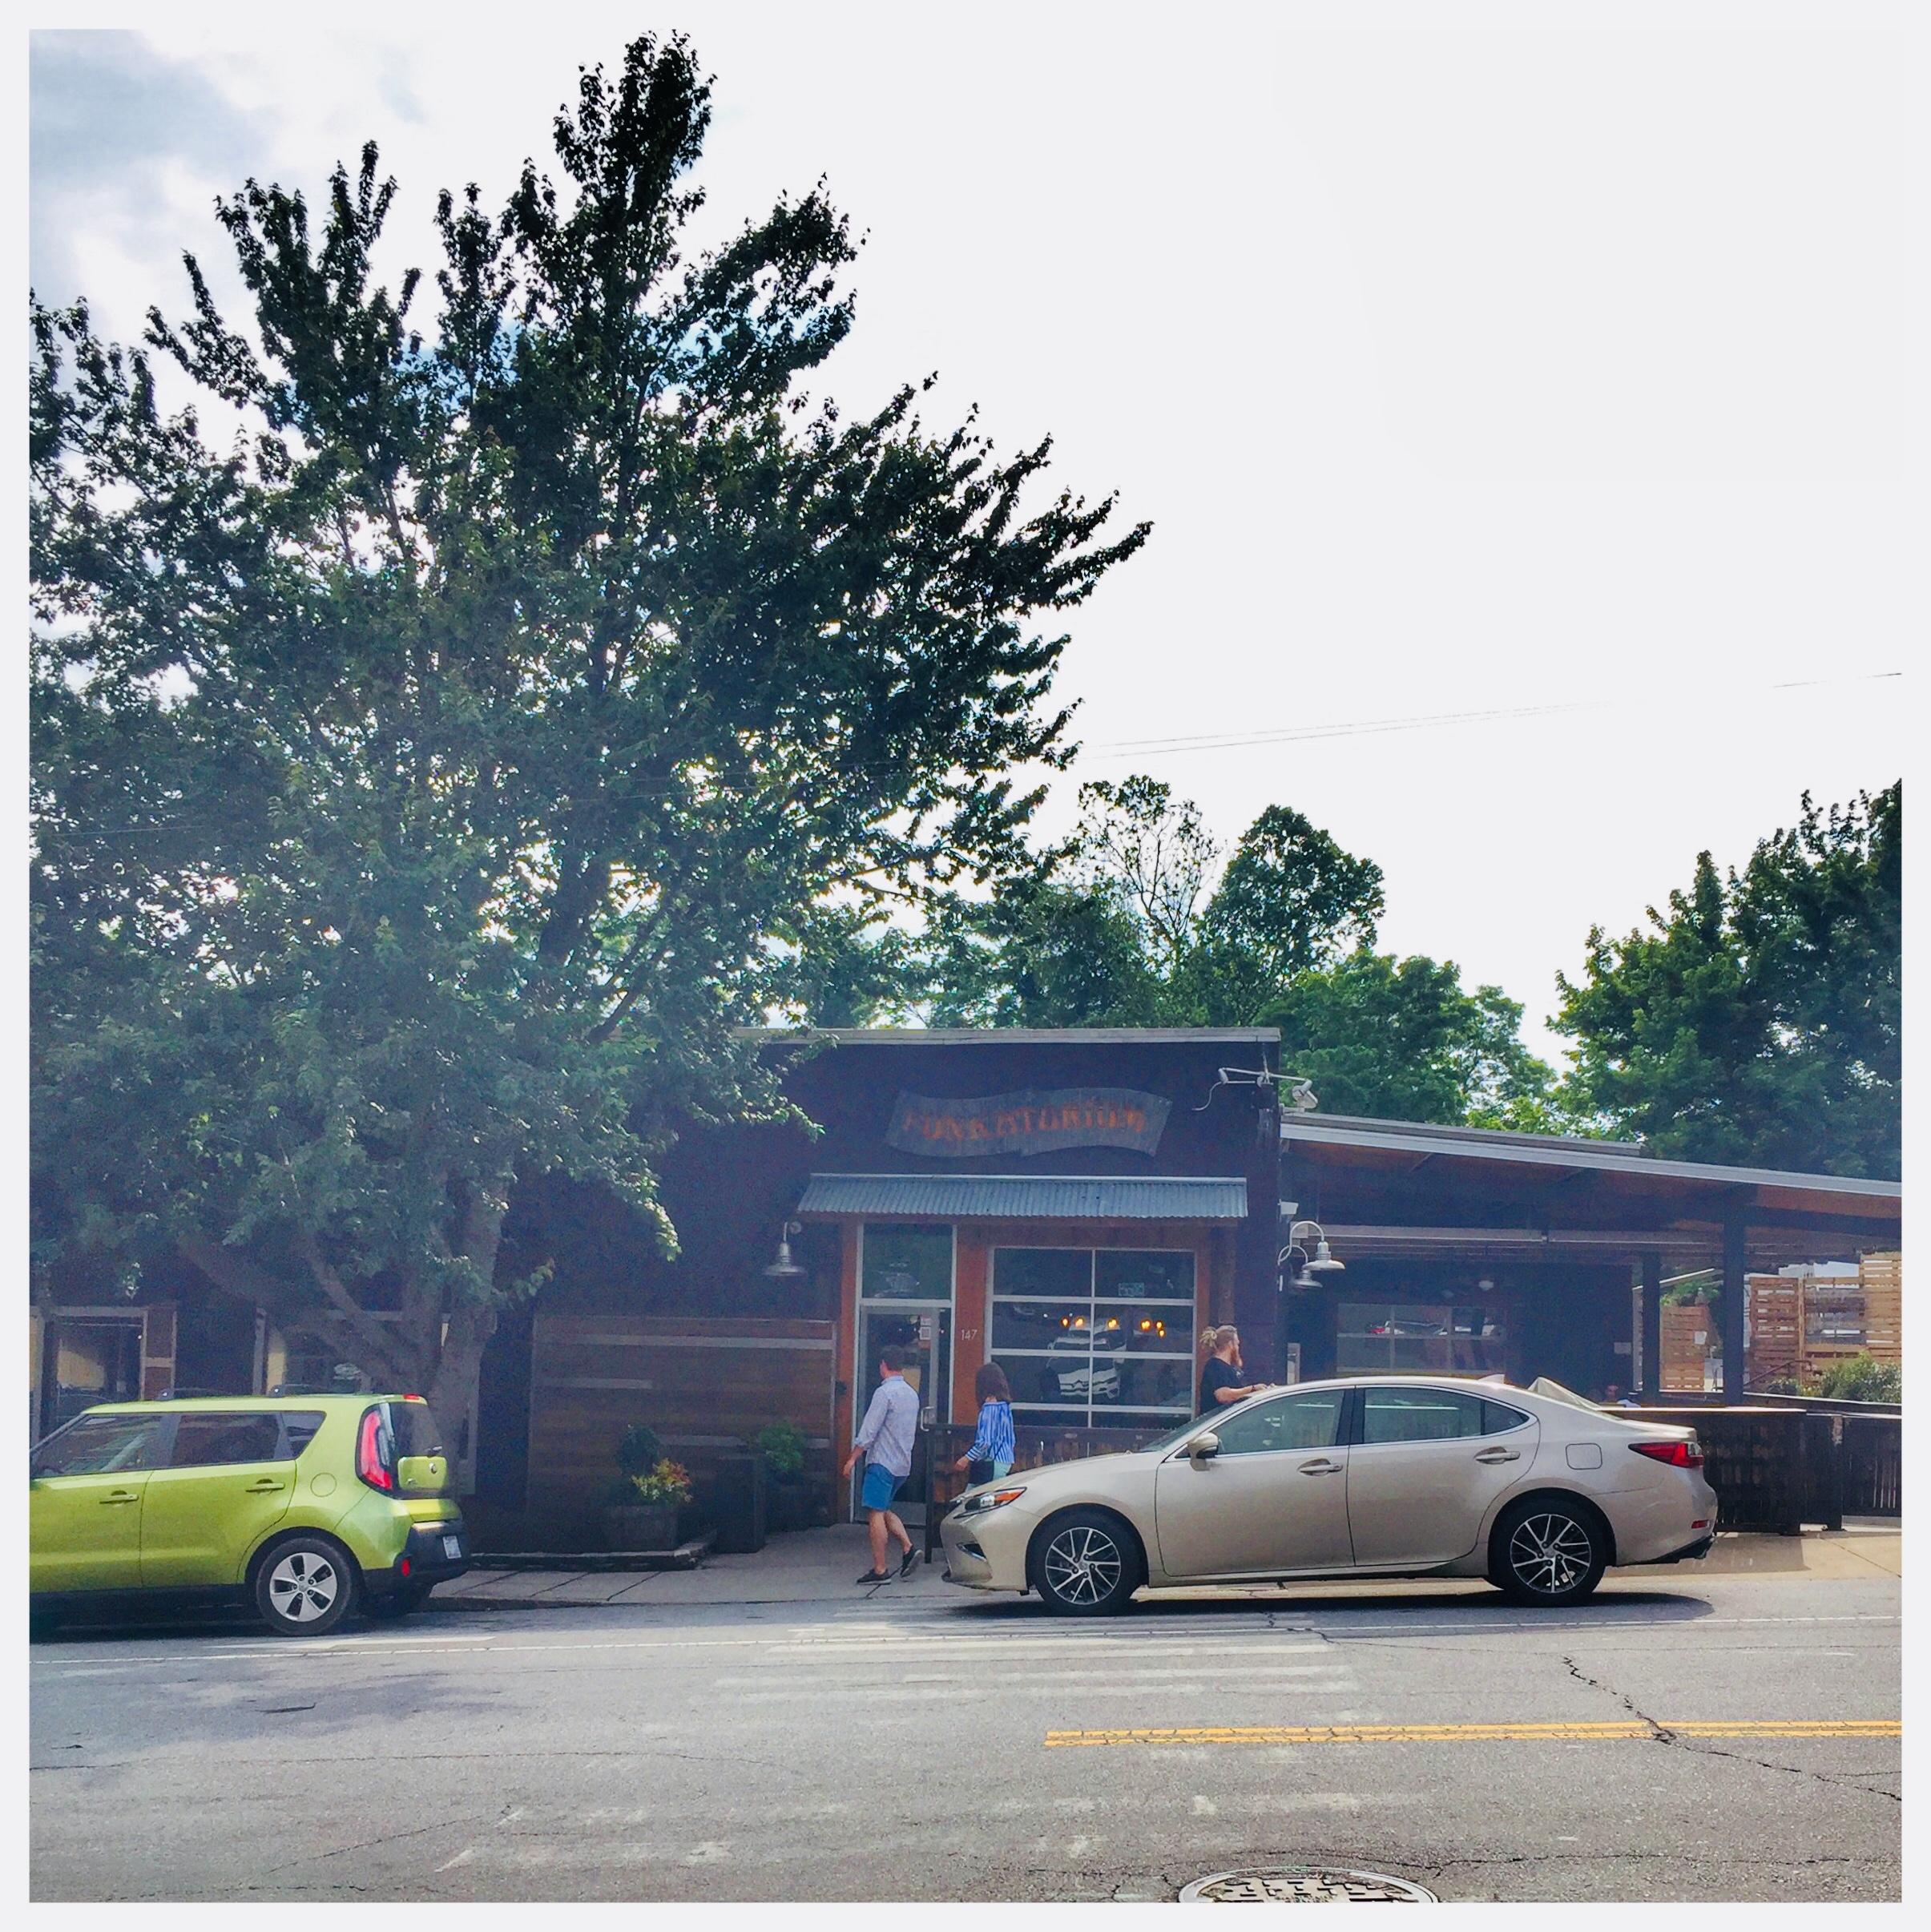 The Wicked Weed Funkatorium streetview